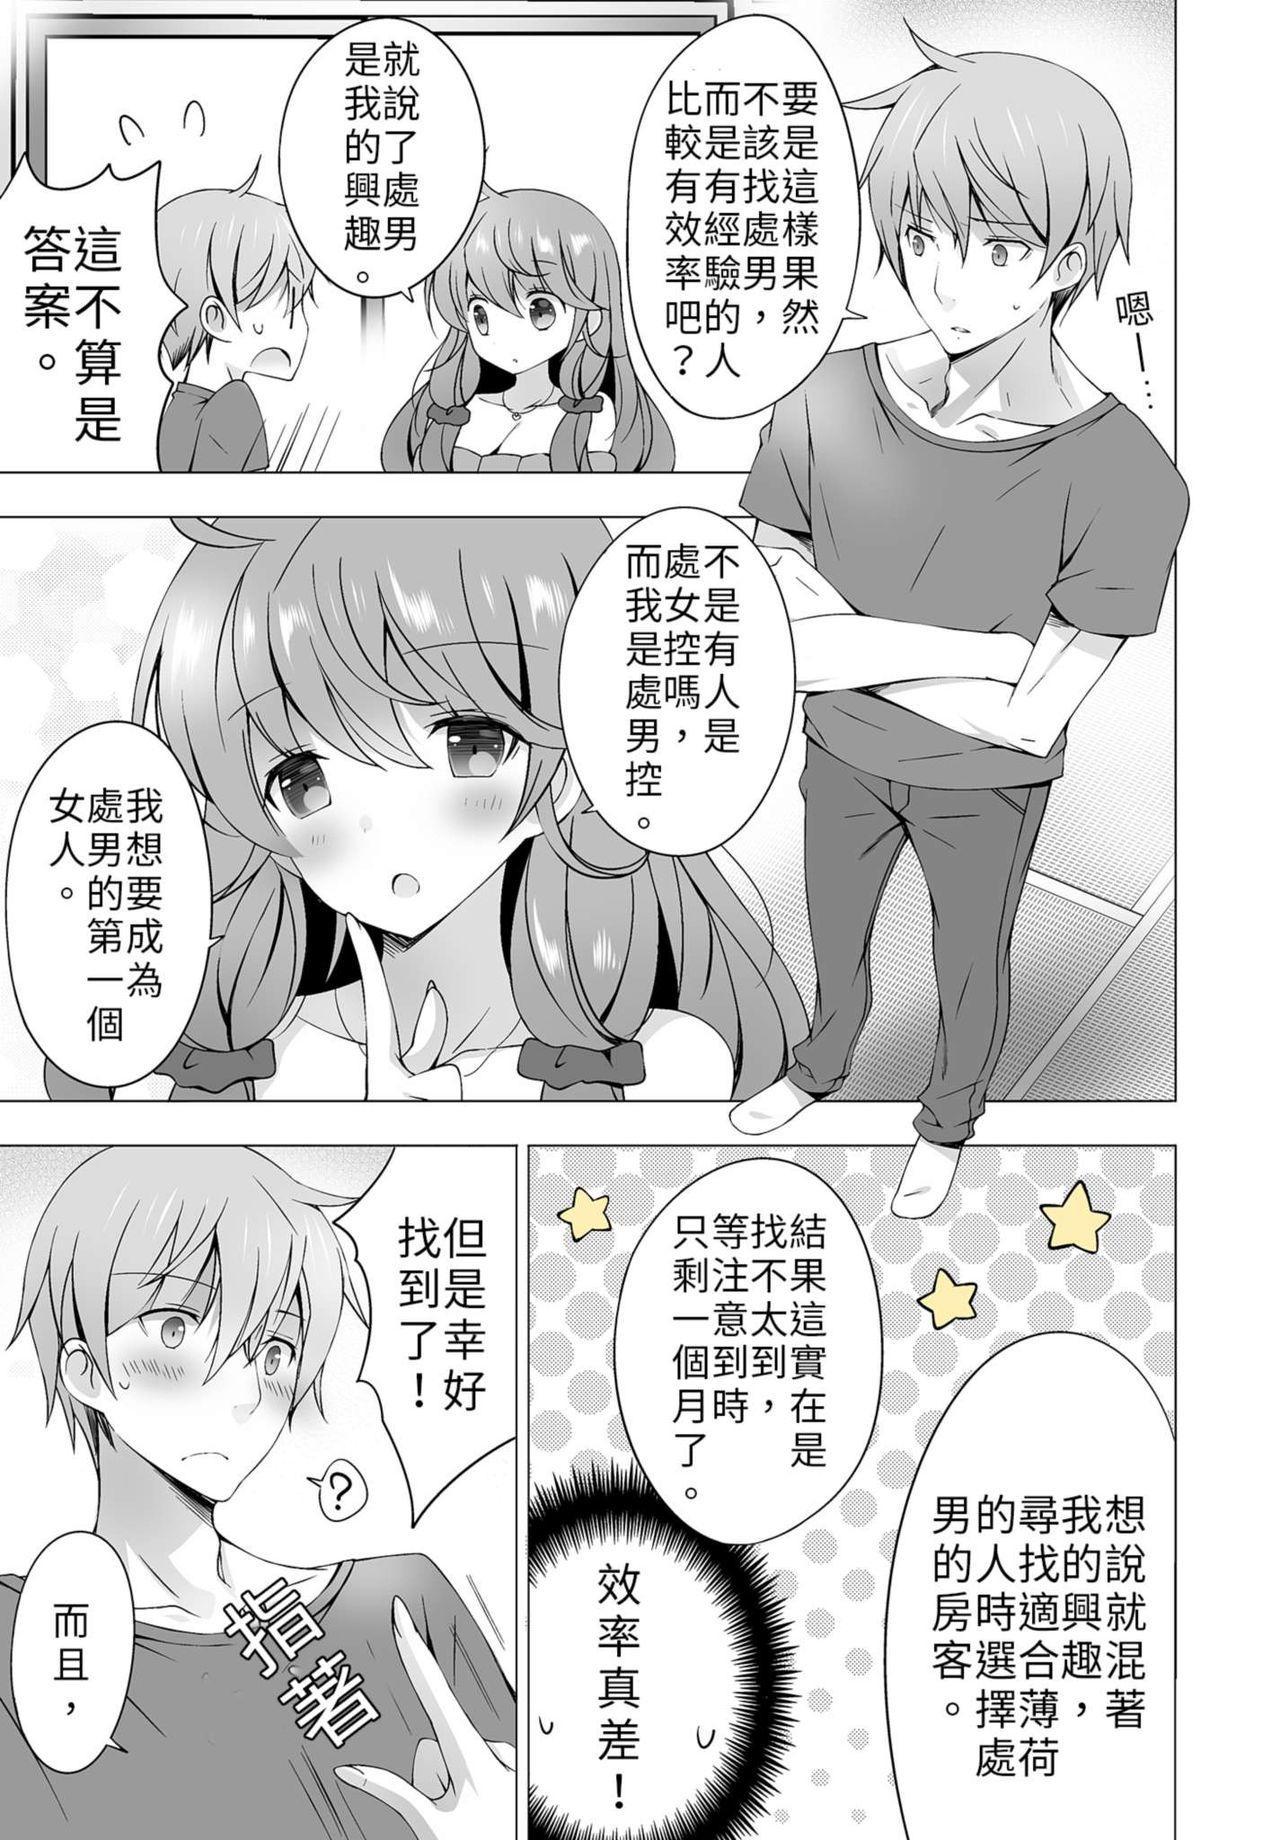 [vanilla] 4LDK Shimai Tsuki ~Muichimon OK, Tadashi Doutei ni Kagiru | 四房一衛一廳附姊妹 ~身無分文OK,但僅限處男~ Ch. 2 [Chinese] 4